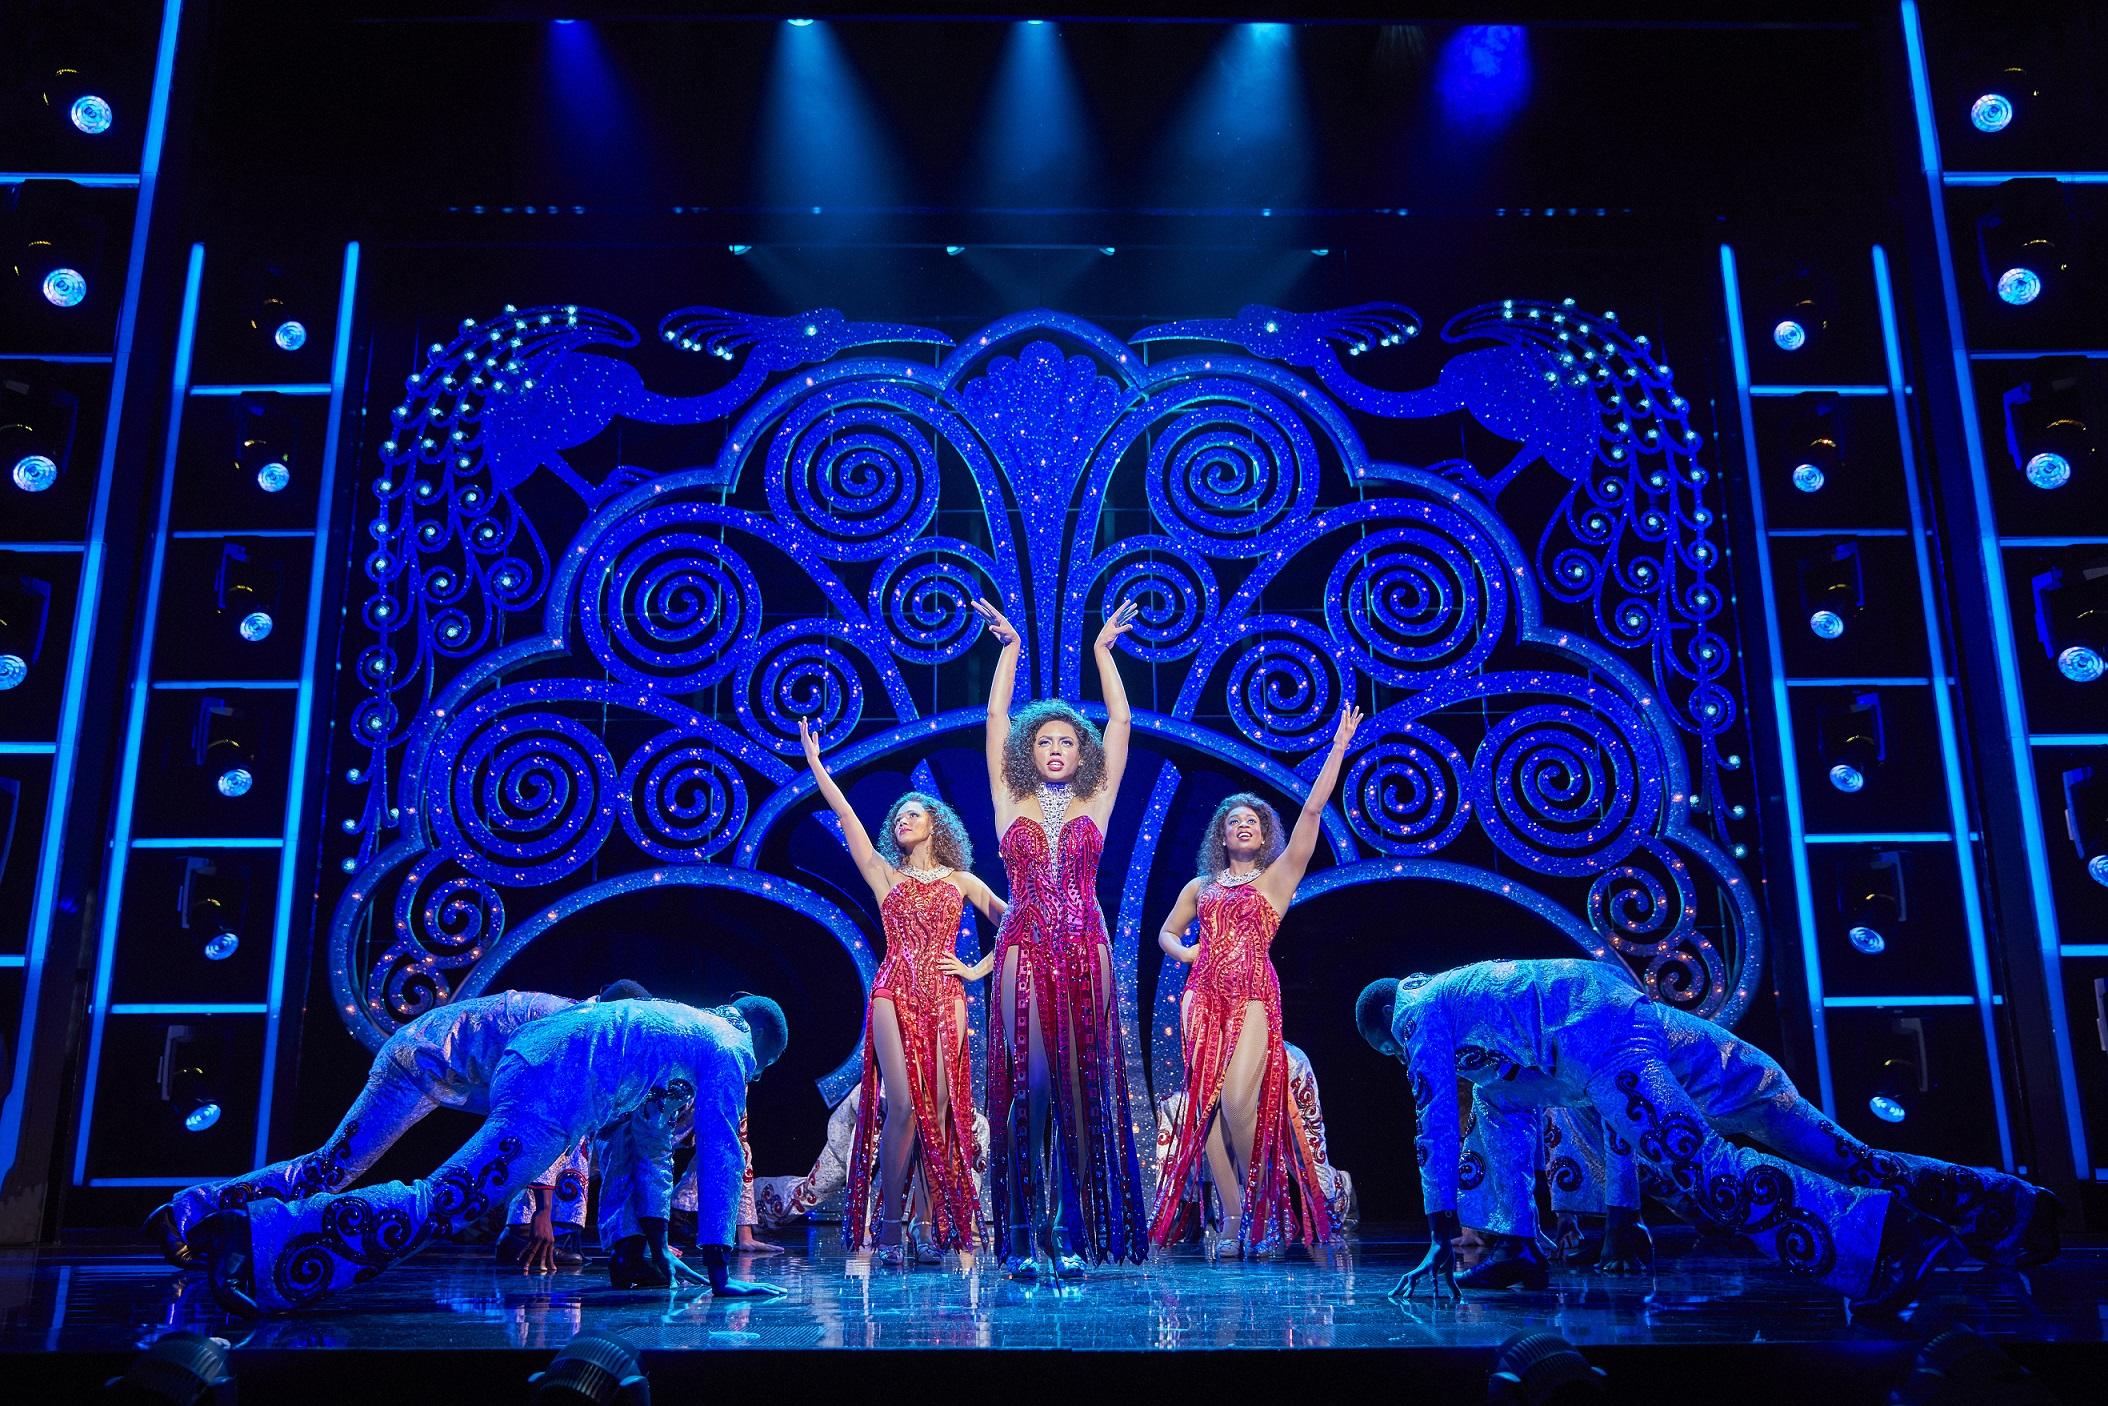 (l-r) Lily Frazer, Liisi LaFontaine and Ibinabo Jack in Dreamgirls at the Savoy Theatre. Credit Brinkhoff & Mögenburg (2).jpg